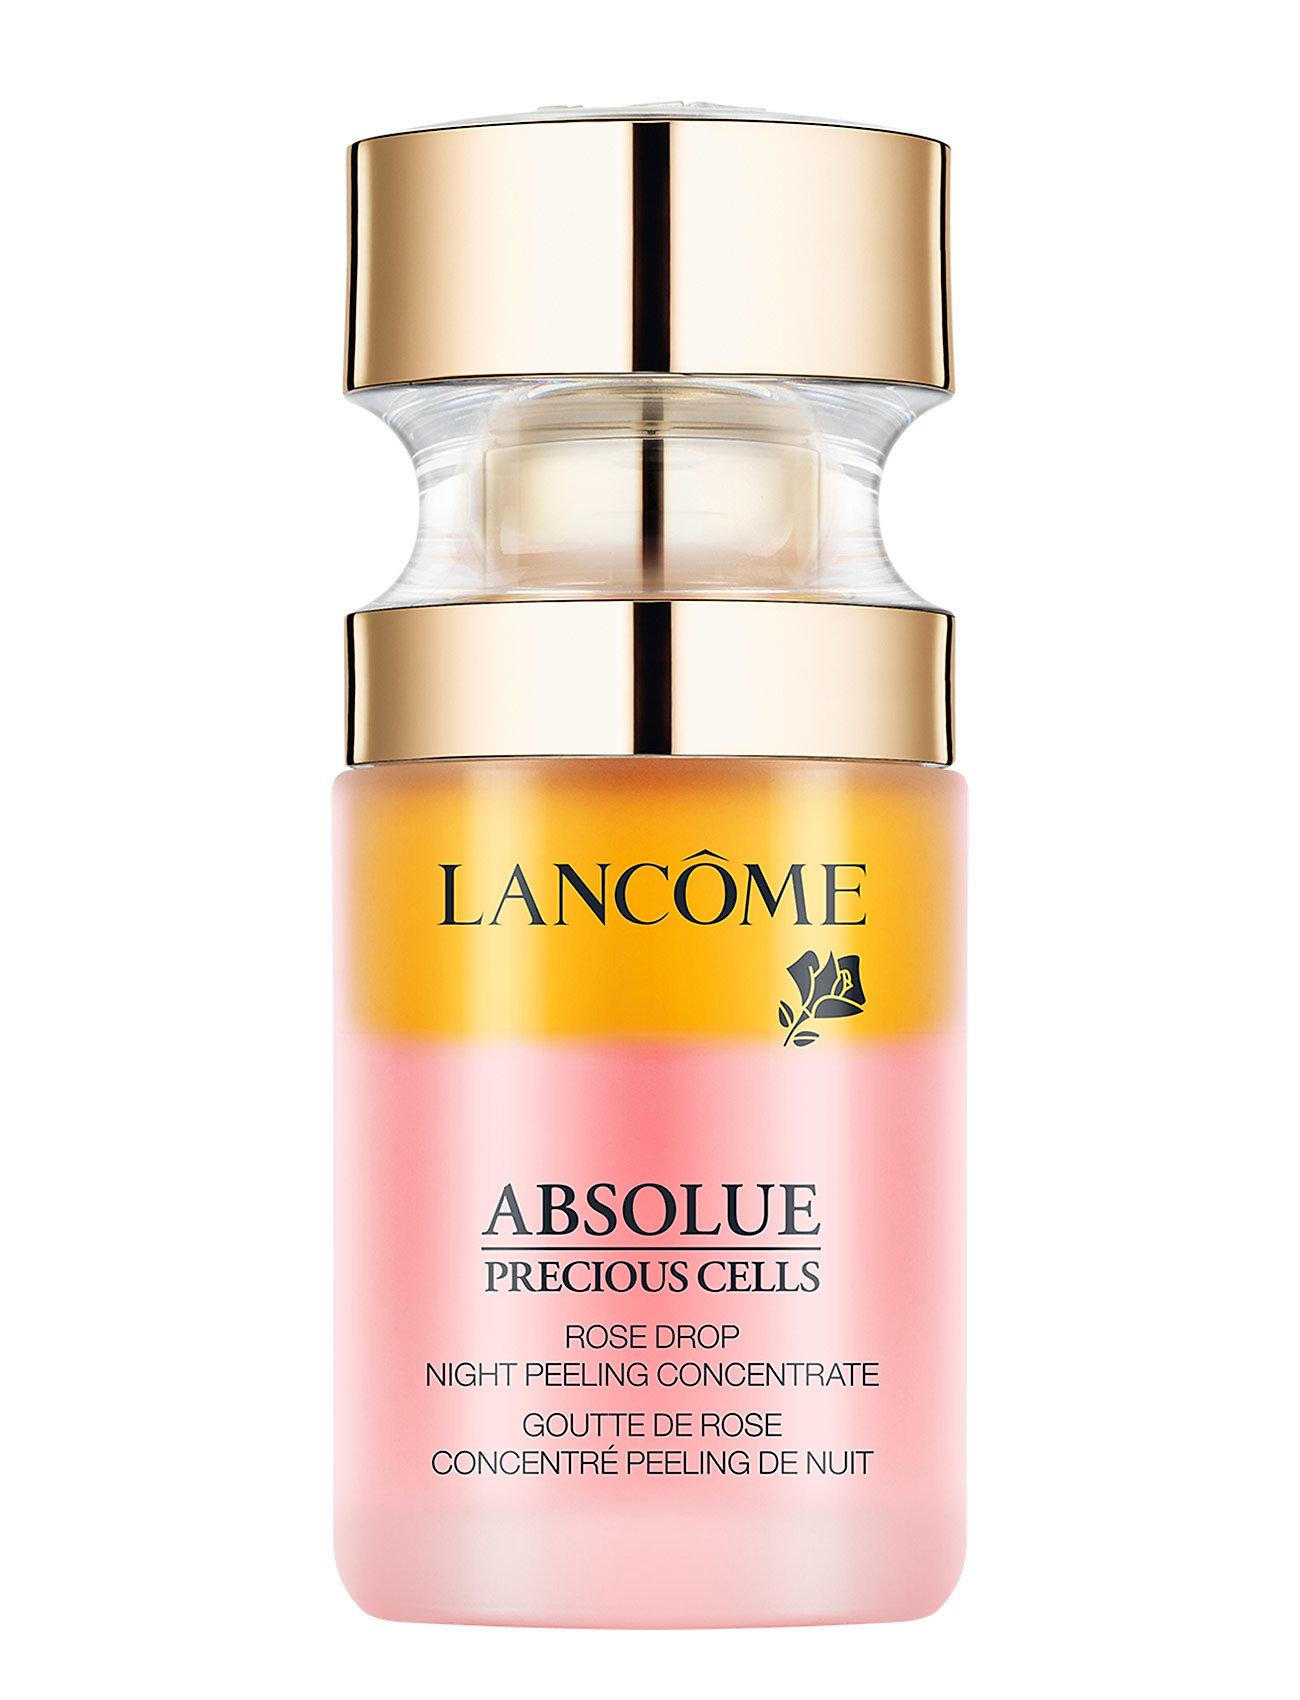 Image of Absolue Precious Cells Rose Drop 15 Ml Beauty WOMEN Skin Care Face Peelings Nude Lancôme (3280836685)